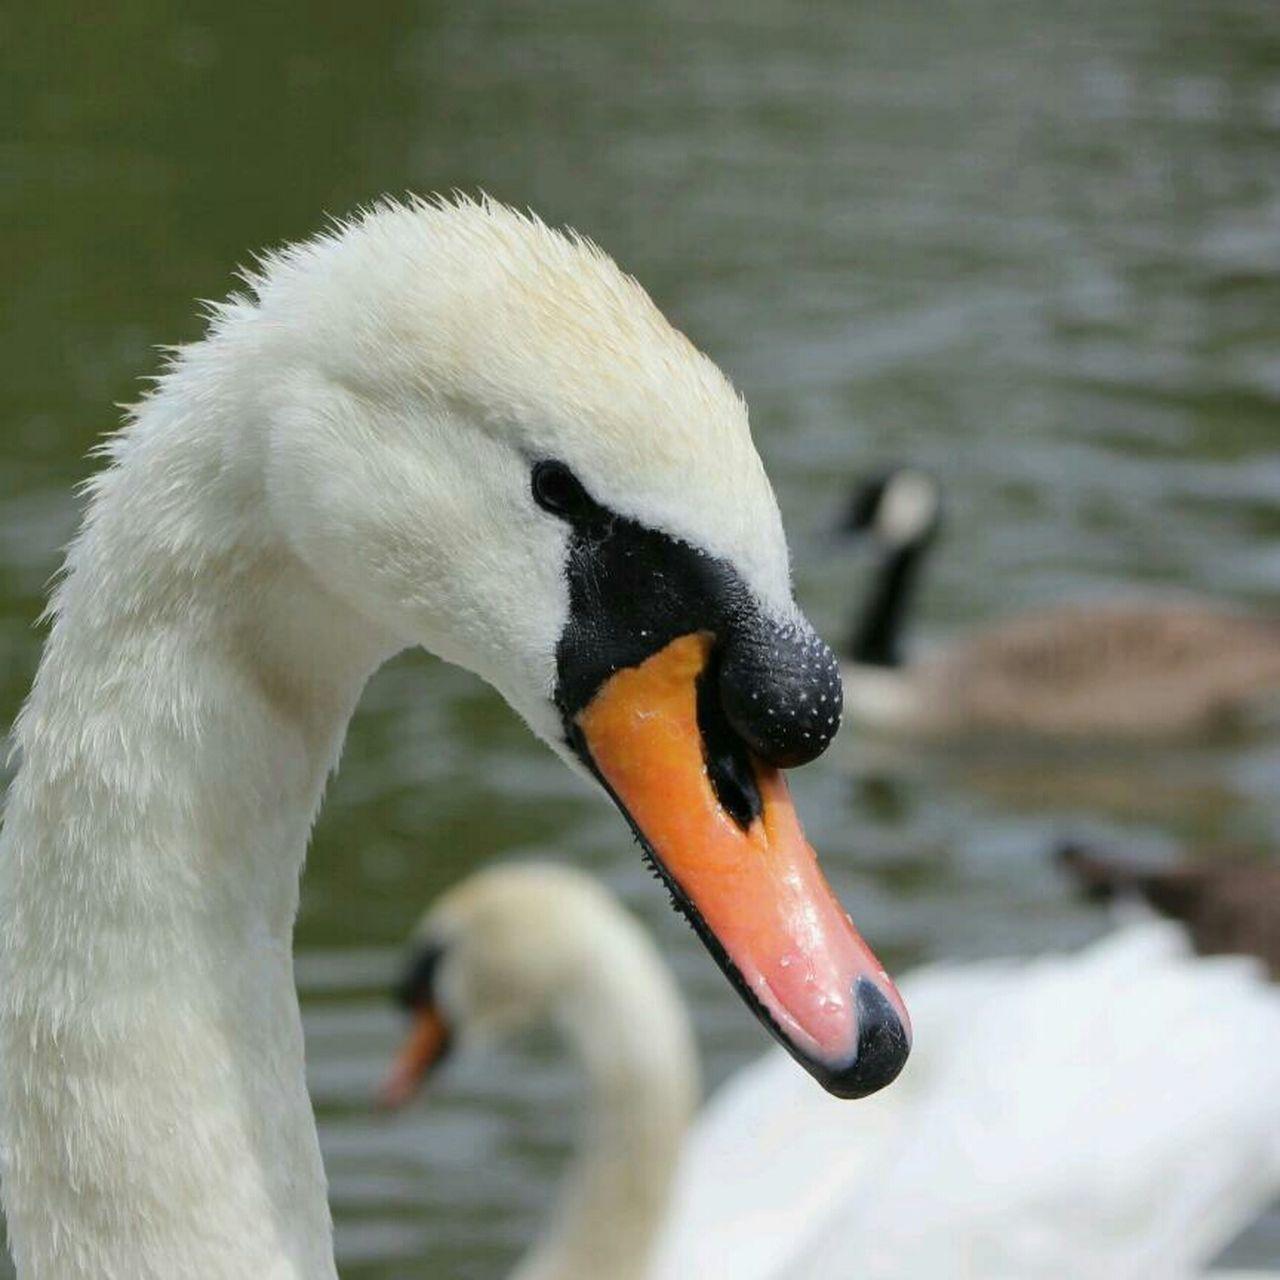 swan, bird, animals in the wild, animal themes, beak, one animal, lake, focus on foreground, white color, animal wildlife, water bird, close-up, swimming, no people, nature, water, day, outdoors, black swan